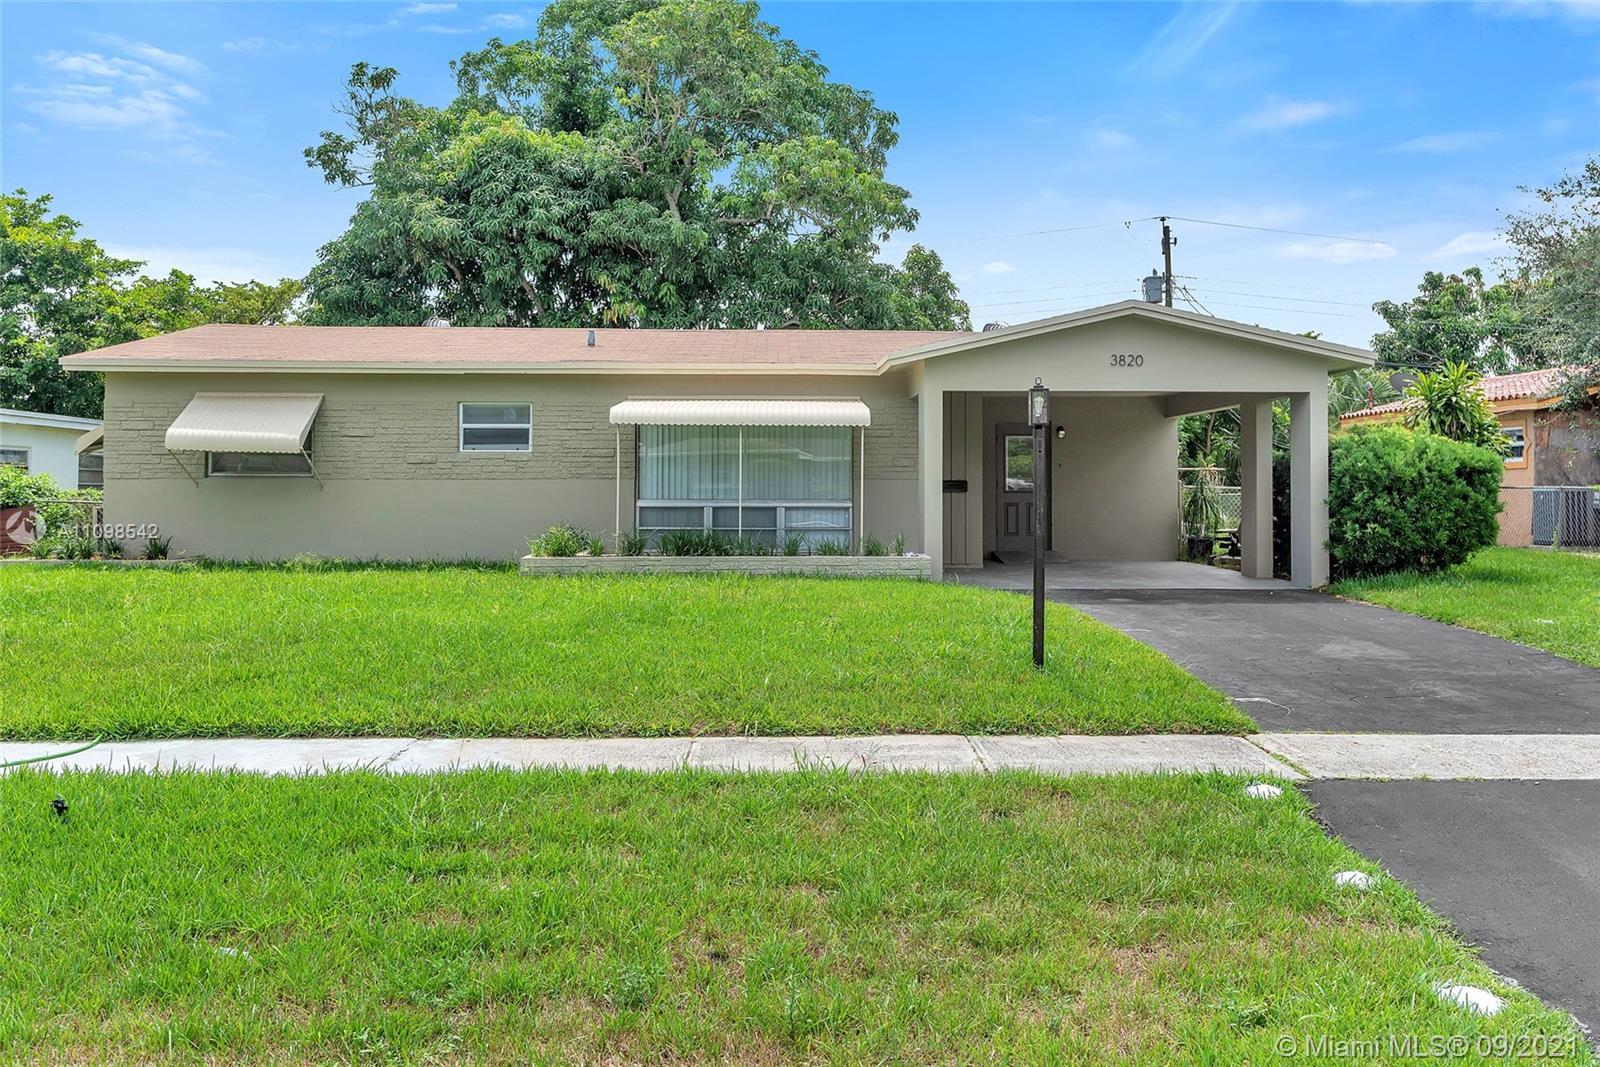 3820 6th Pl, Lauderhill, Florida 33311